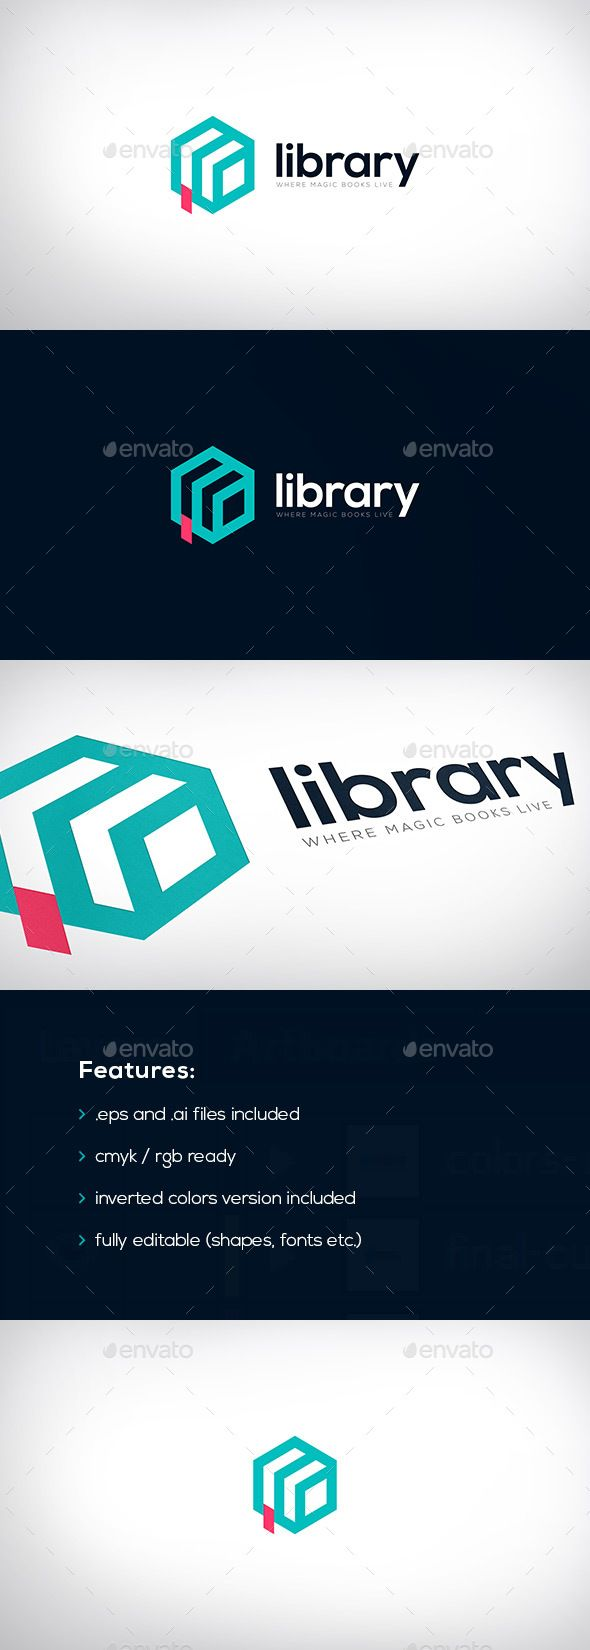 Library Logo Template Vector EPS, AI Illustrator. Download here: https://graphicriver.net/item/library-logo/17573488?ref=ksioks